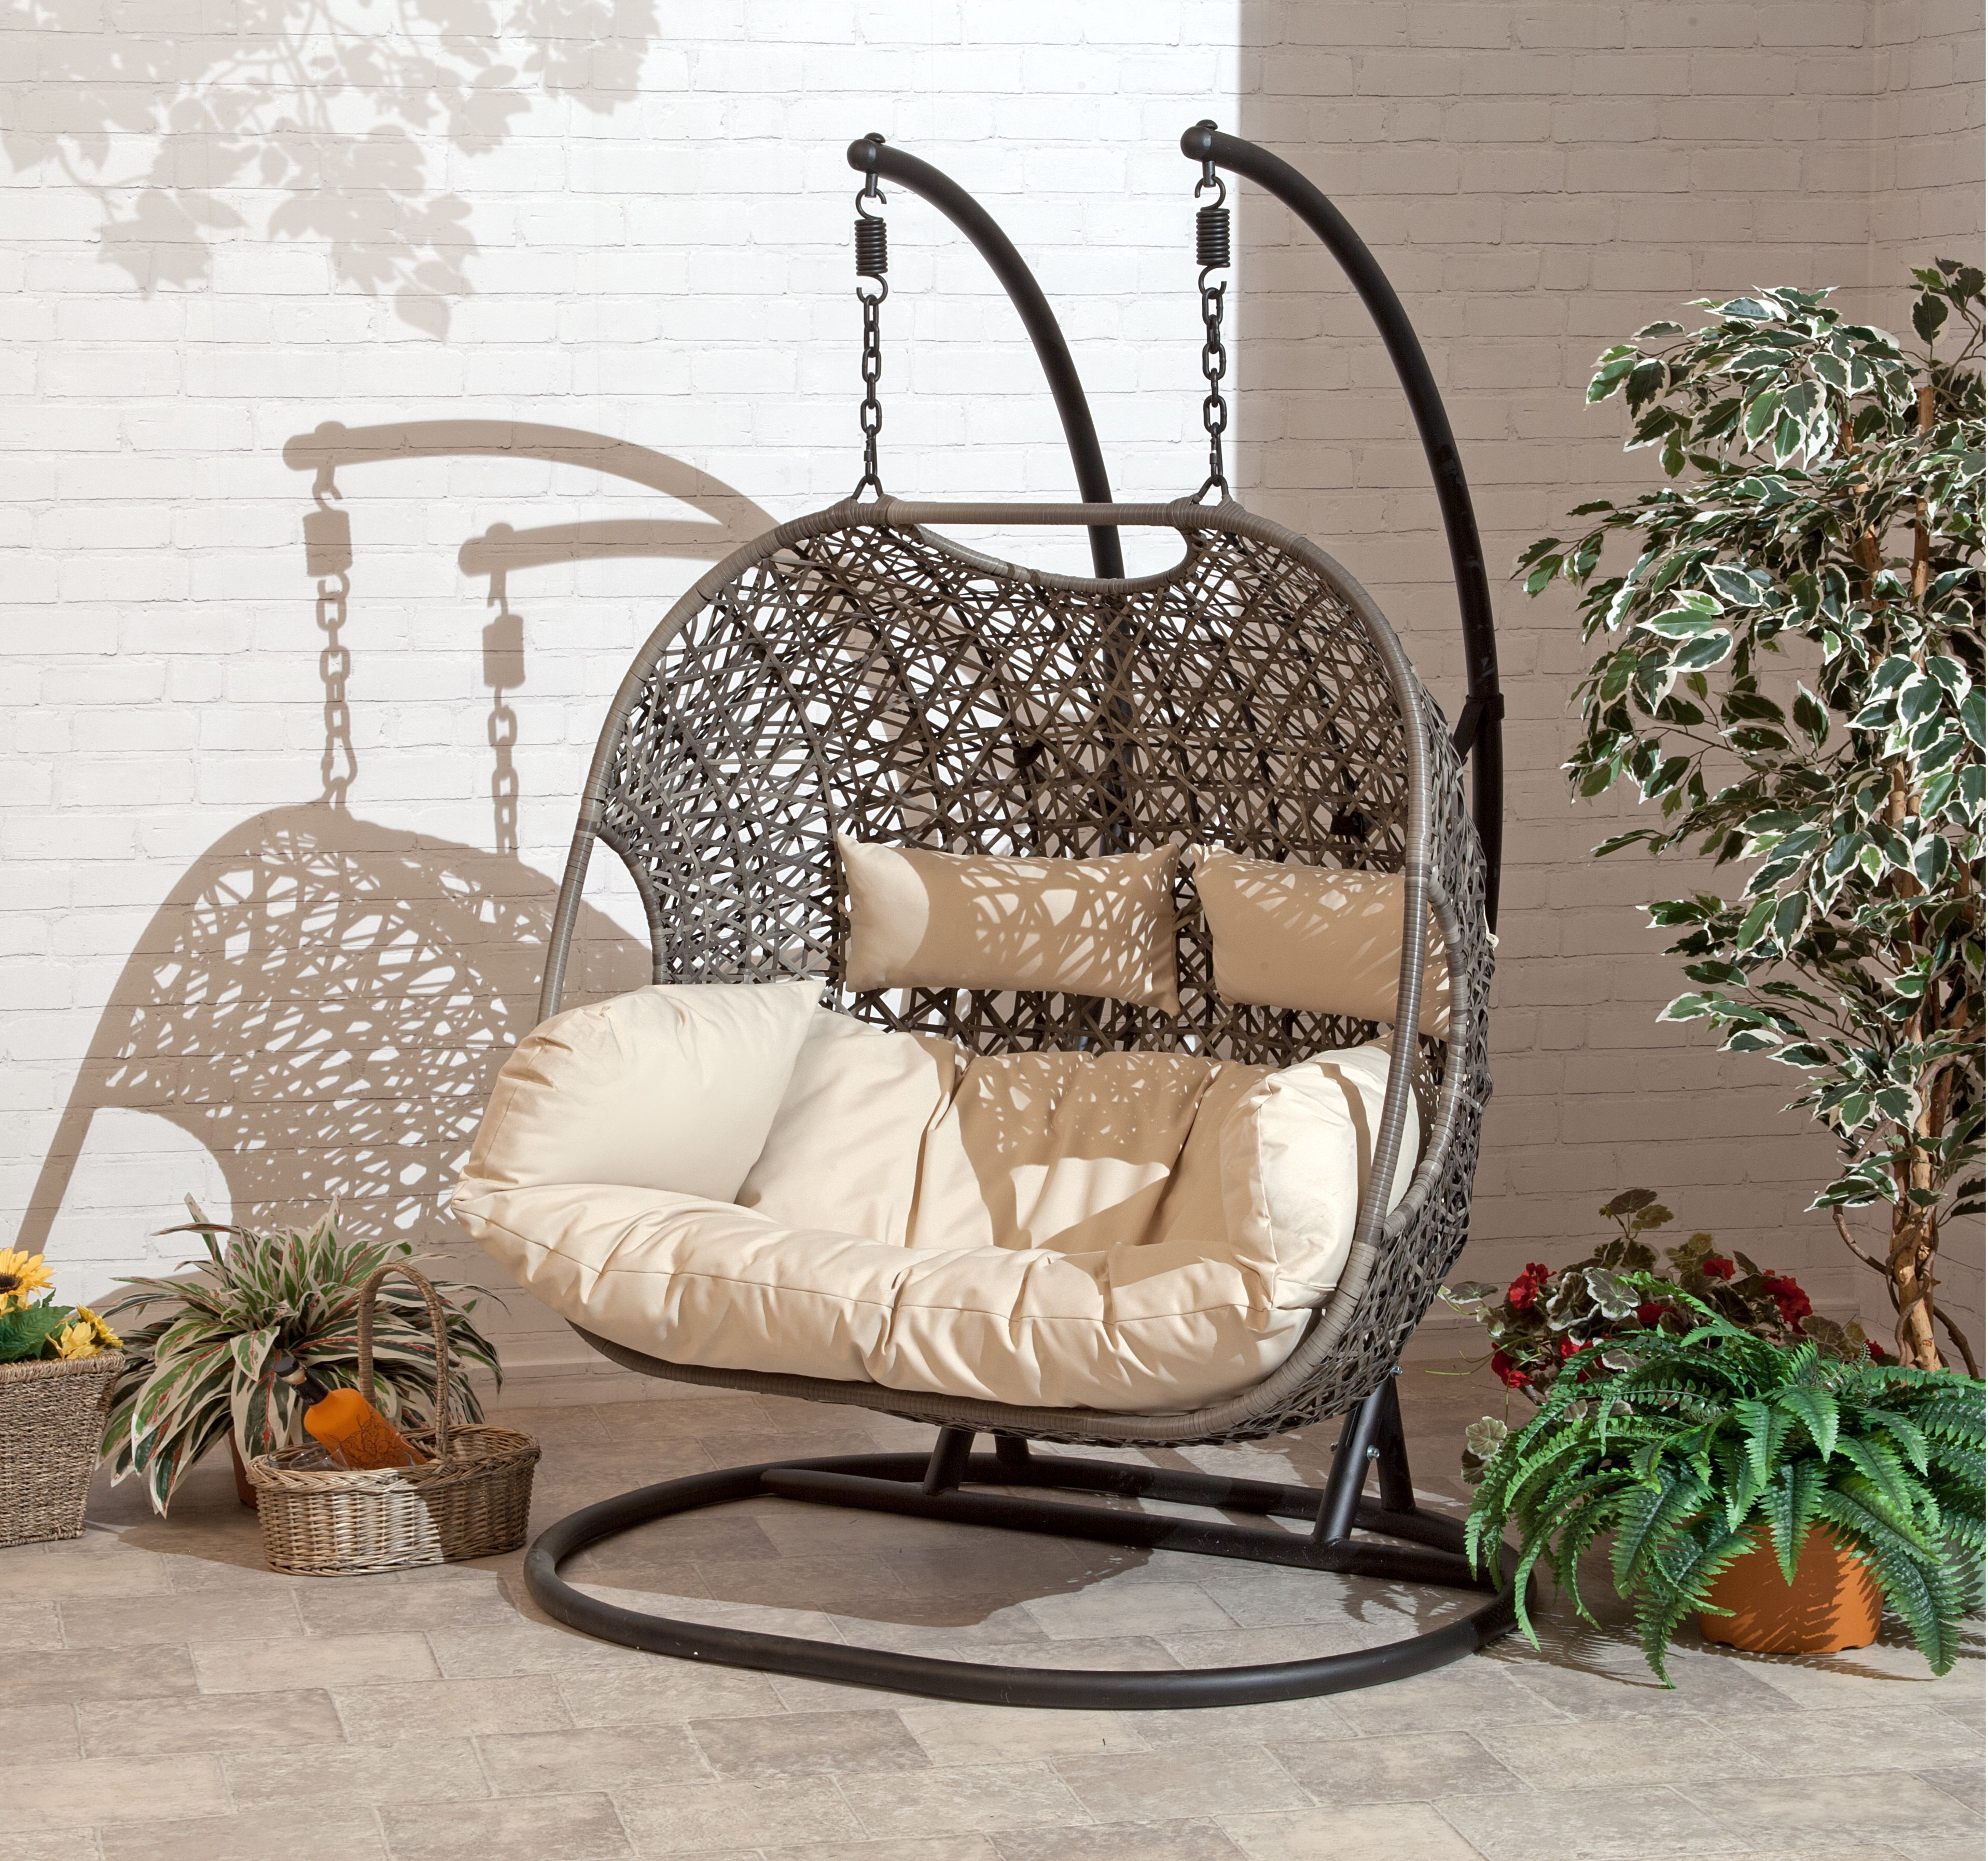 Brampton Double Cocoon Chair Walmart Com Patio Swing Chair Swinging Chair Hanging Garden Chair